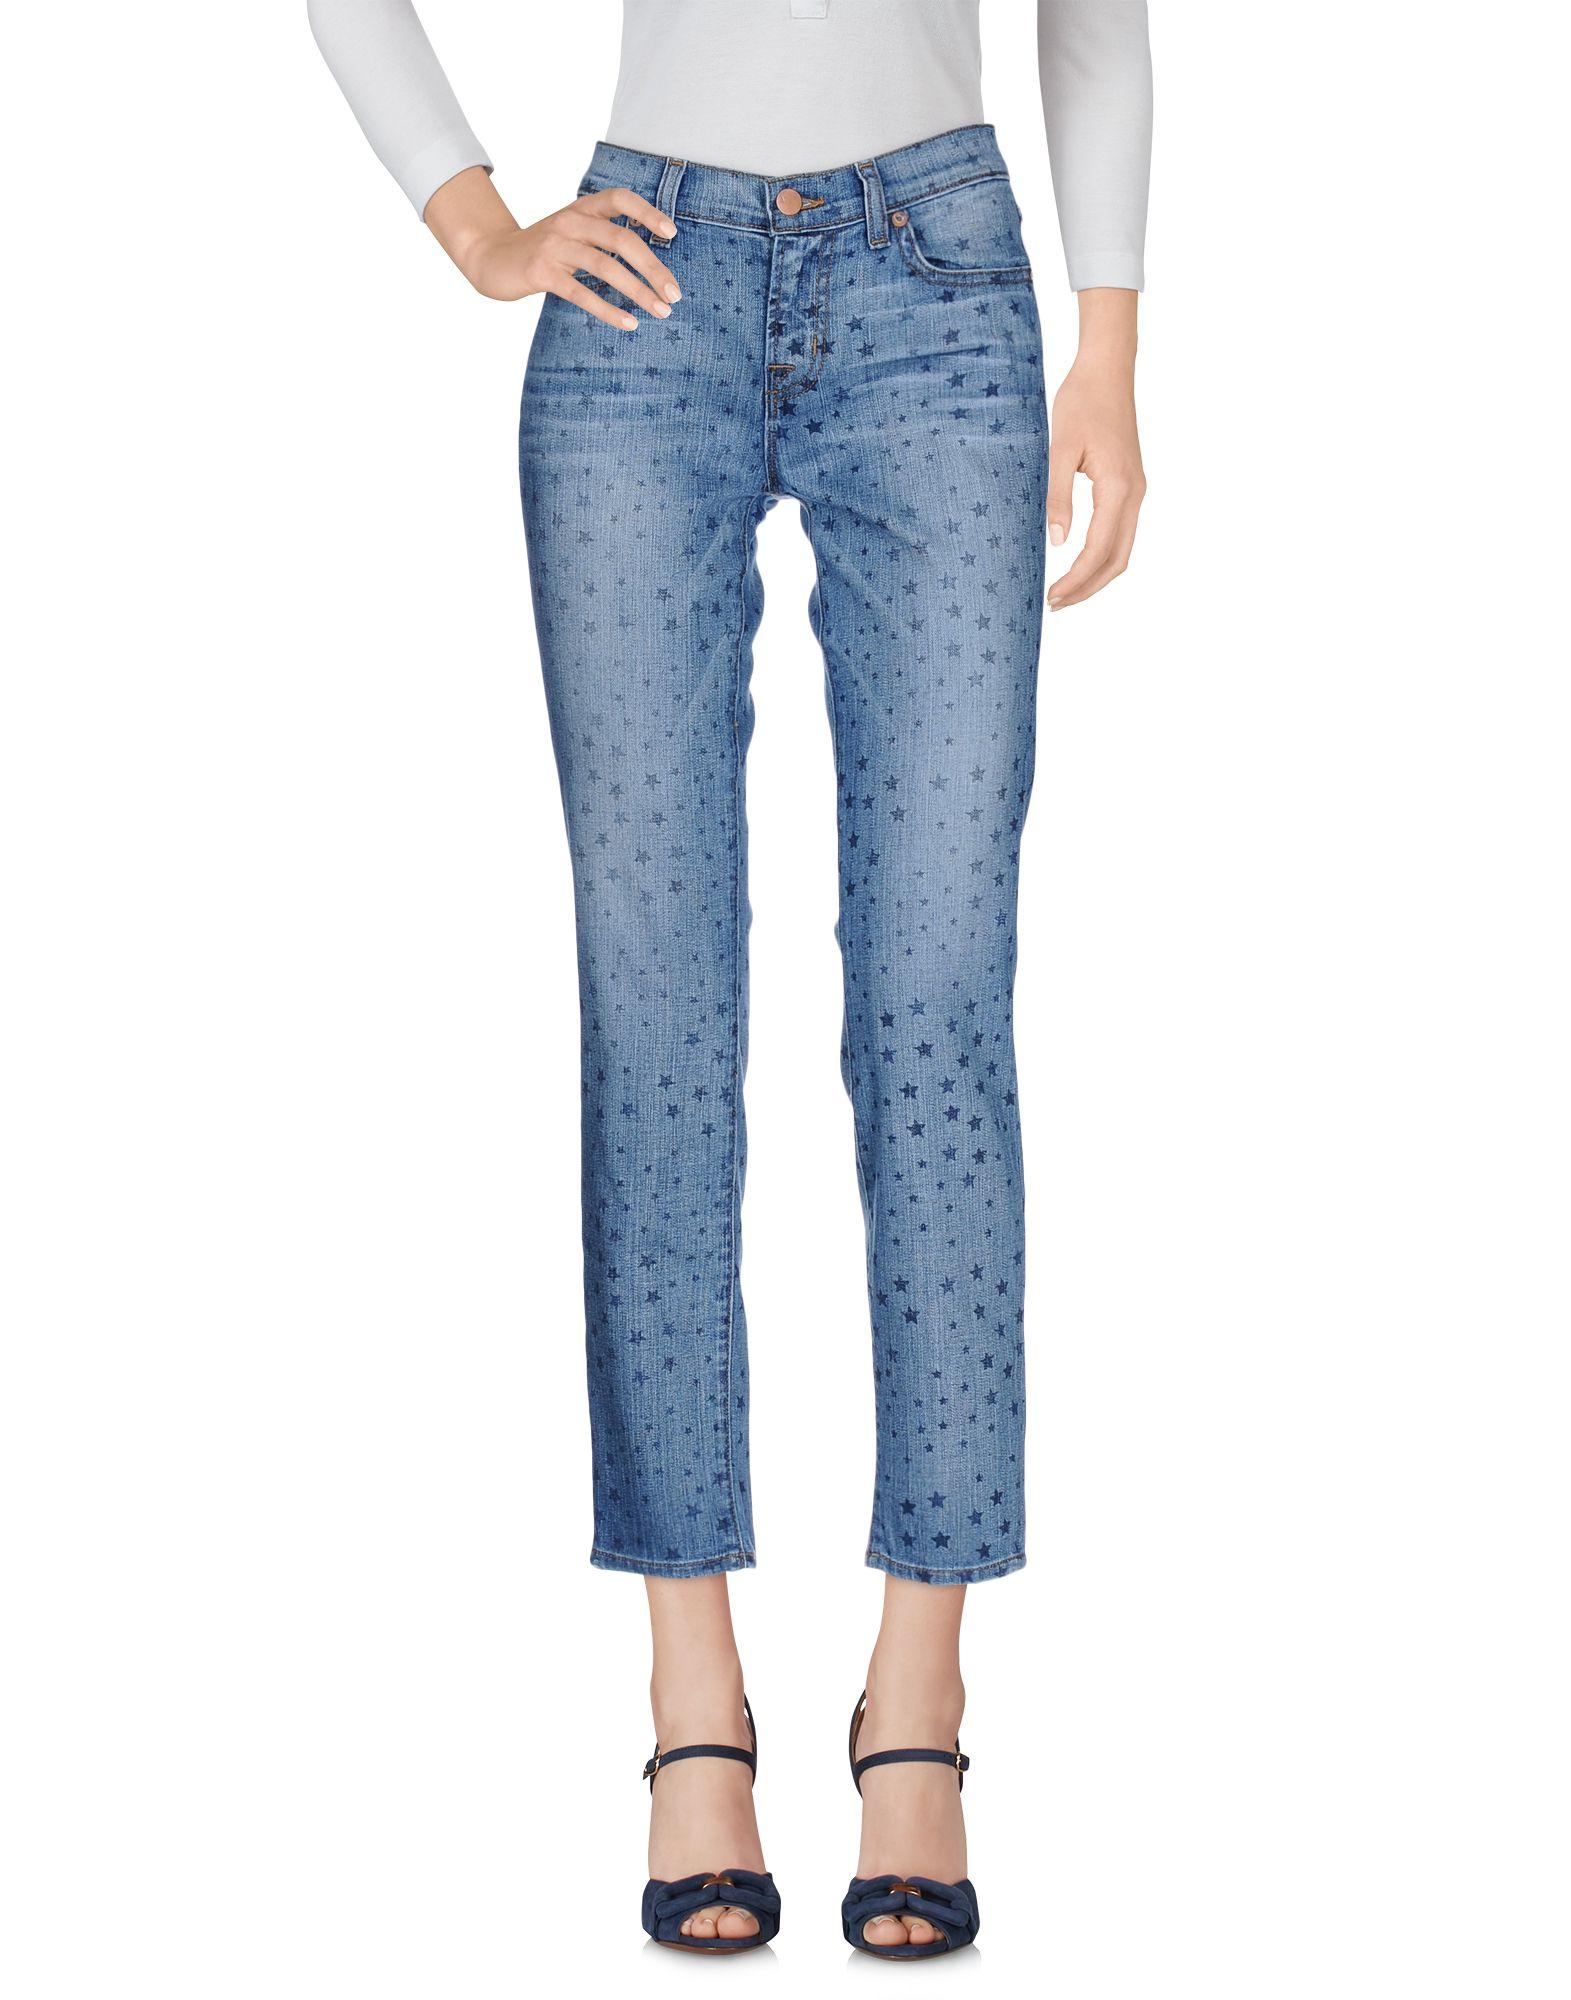 J BRAND Damen Jeanshose Farbe Blau Größe 2 - broschei